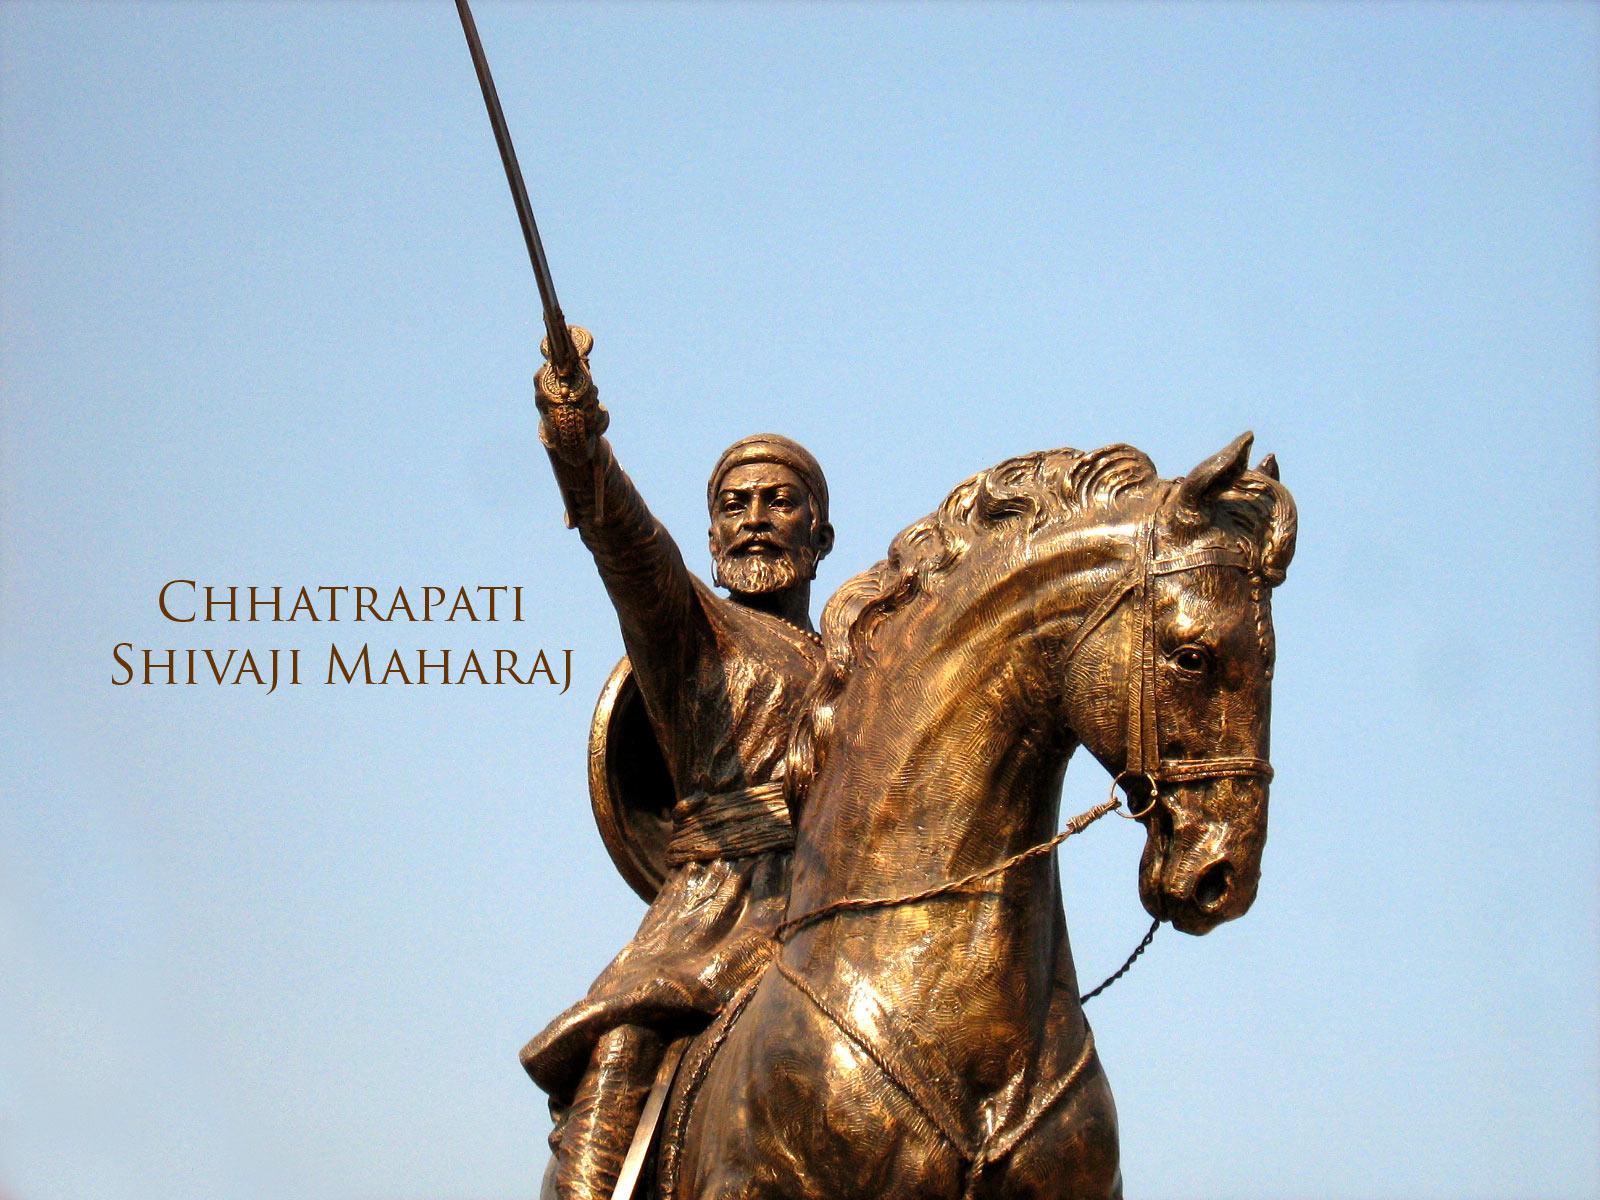 Shivaji Maharaj Hd Wallpaper Free Download